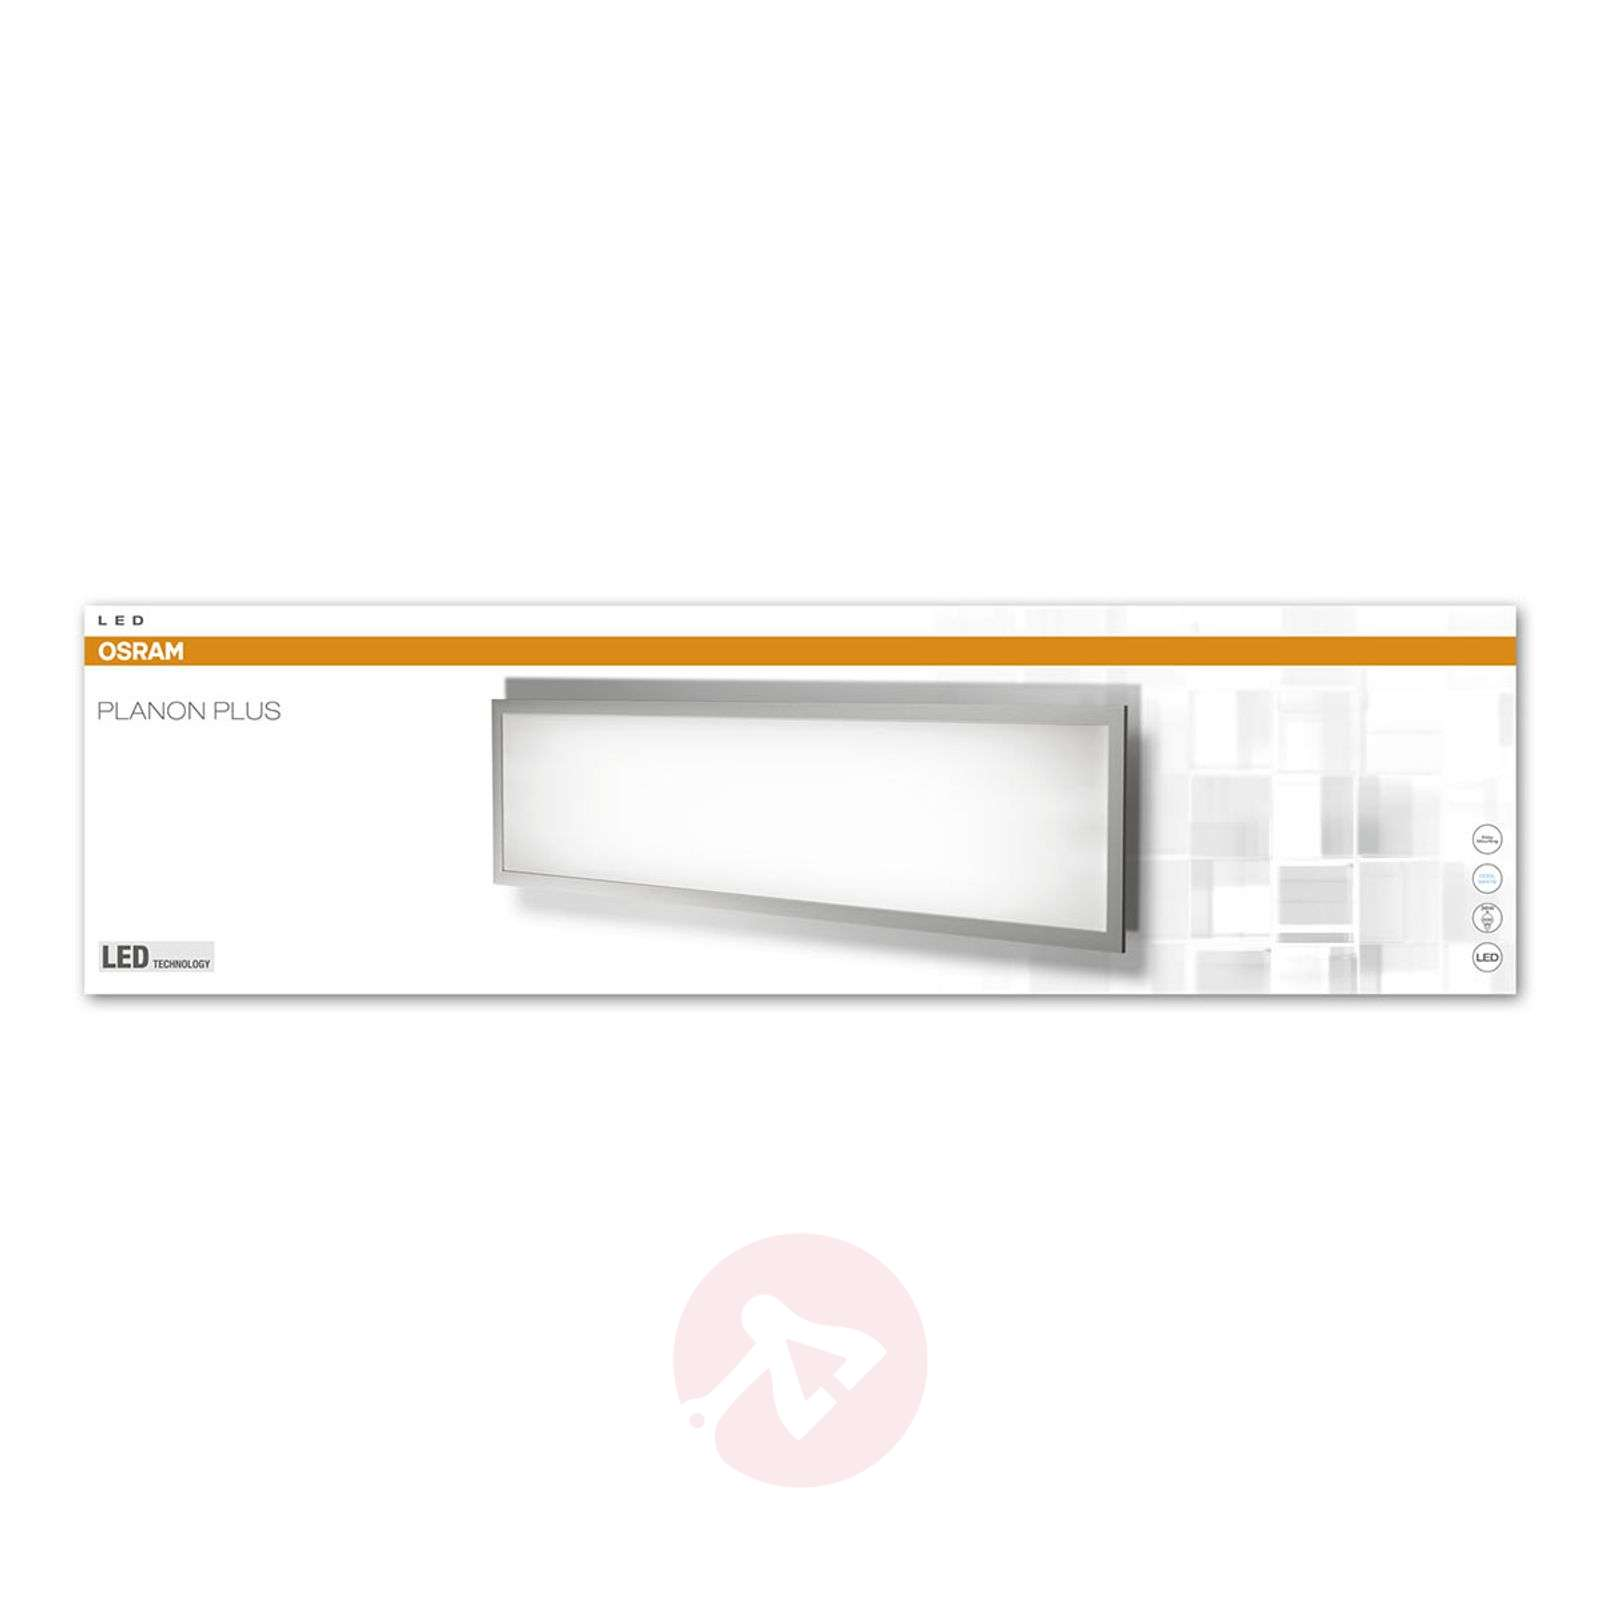 Tehokas LED-paneeli Planon Plus-7261230-01